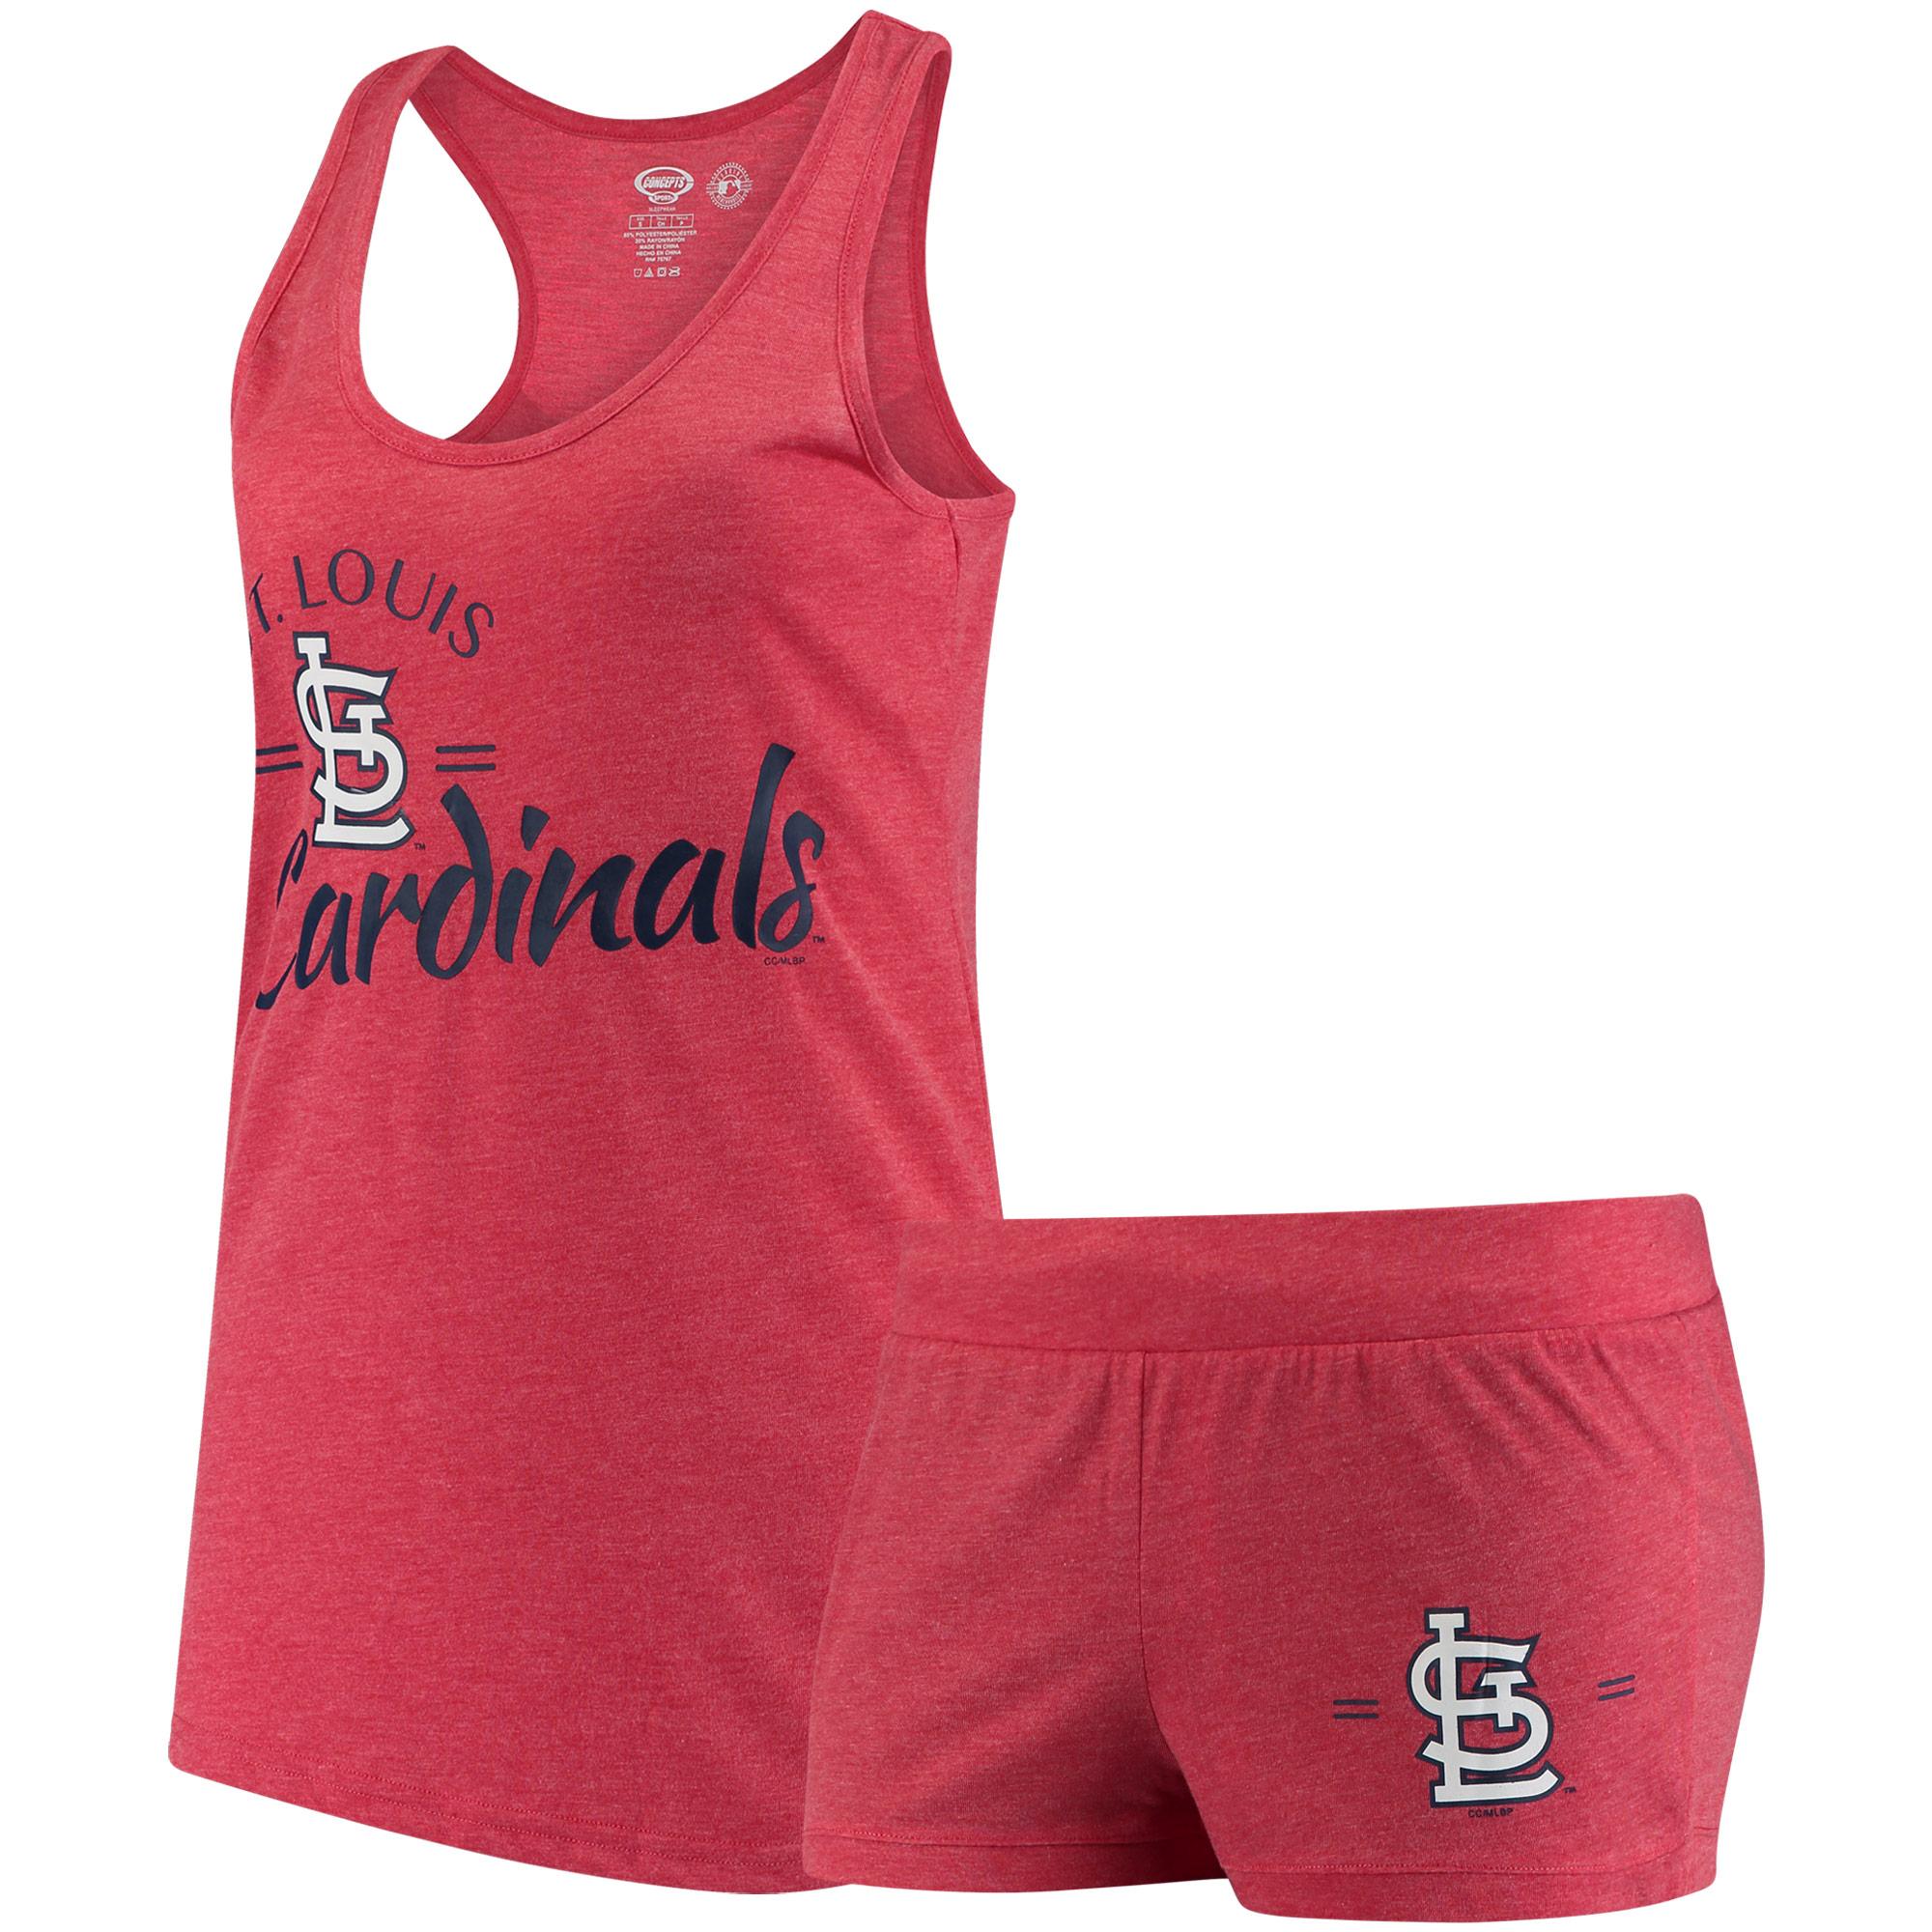 St. Louis Cardinals Concepts Sport Women's Principle Tank Top and Shorts Set - Red